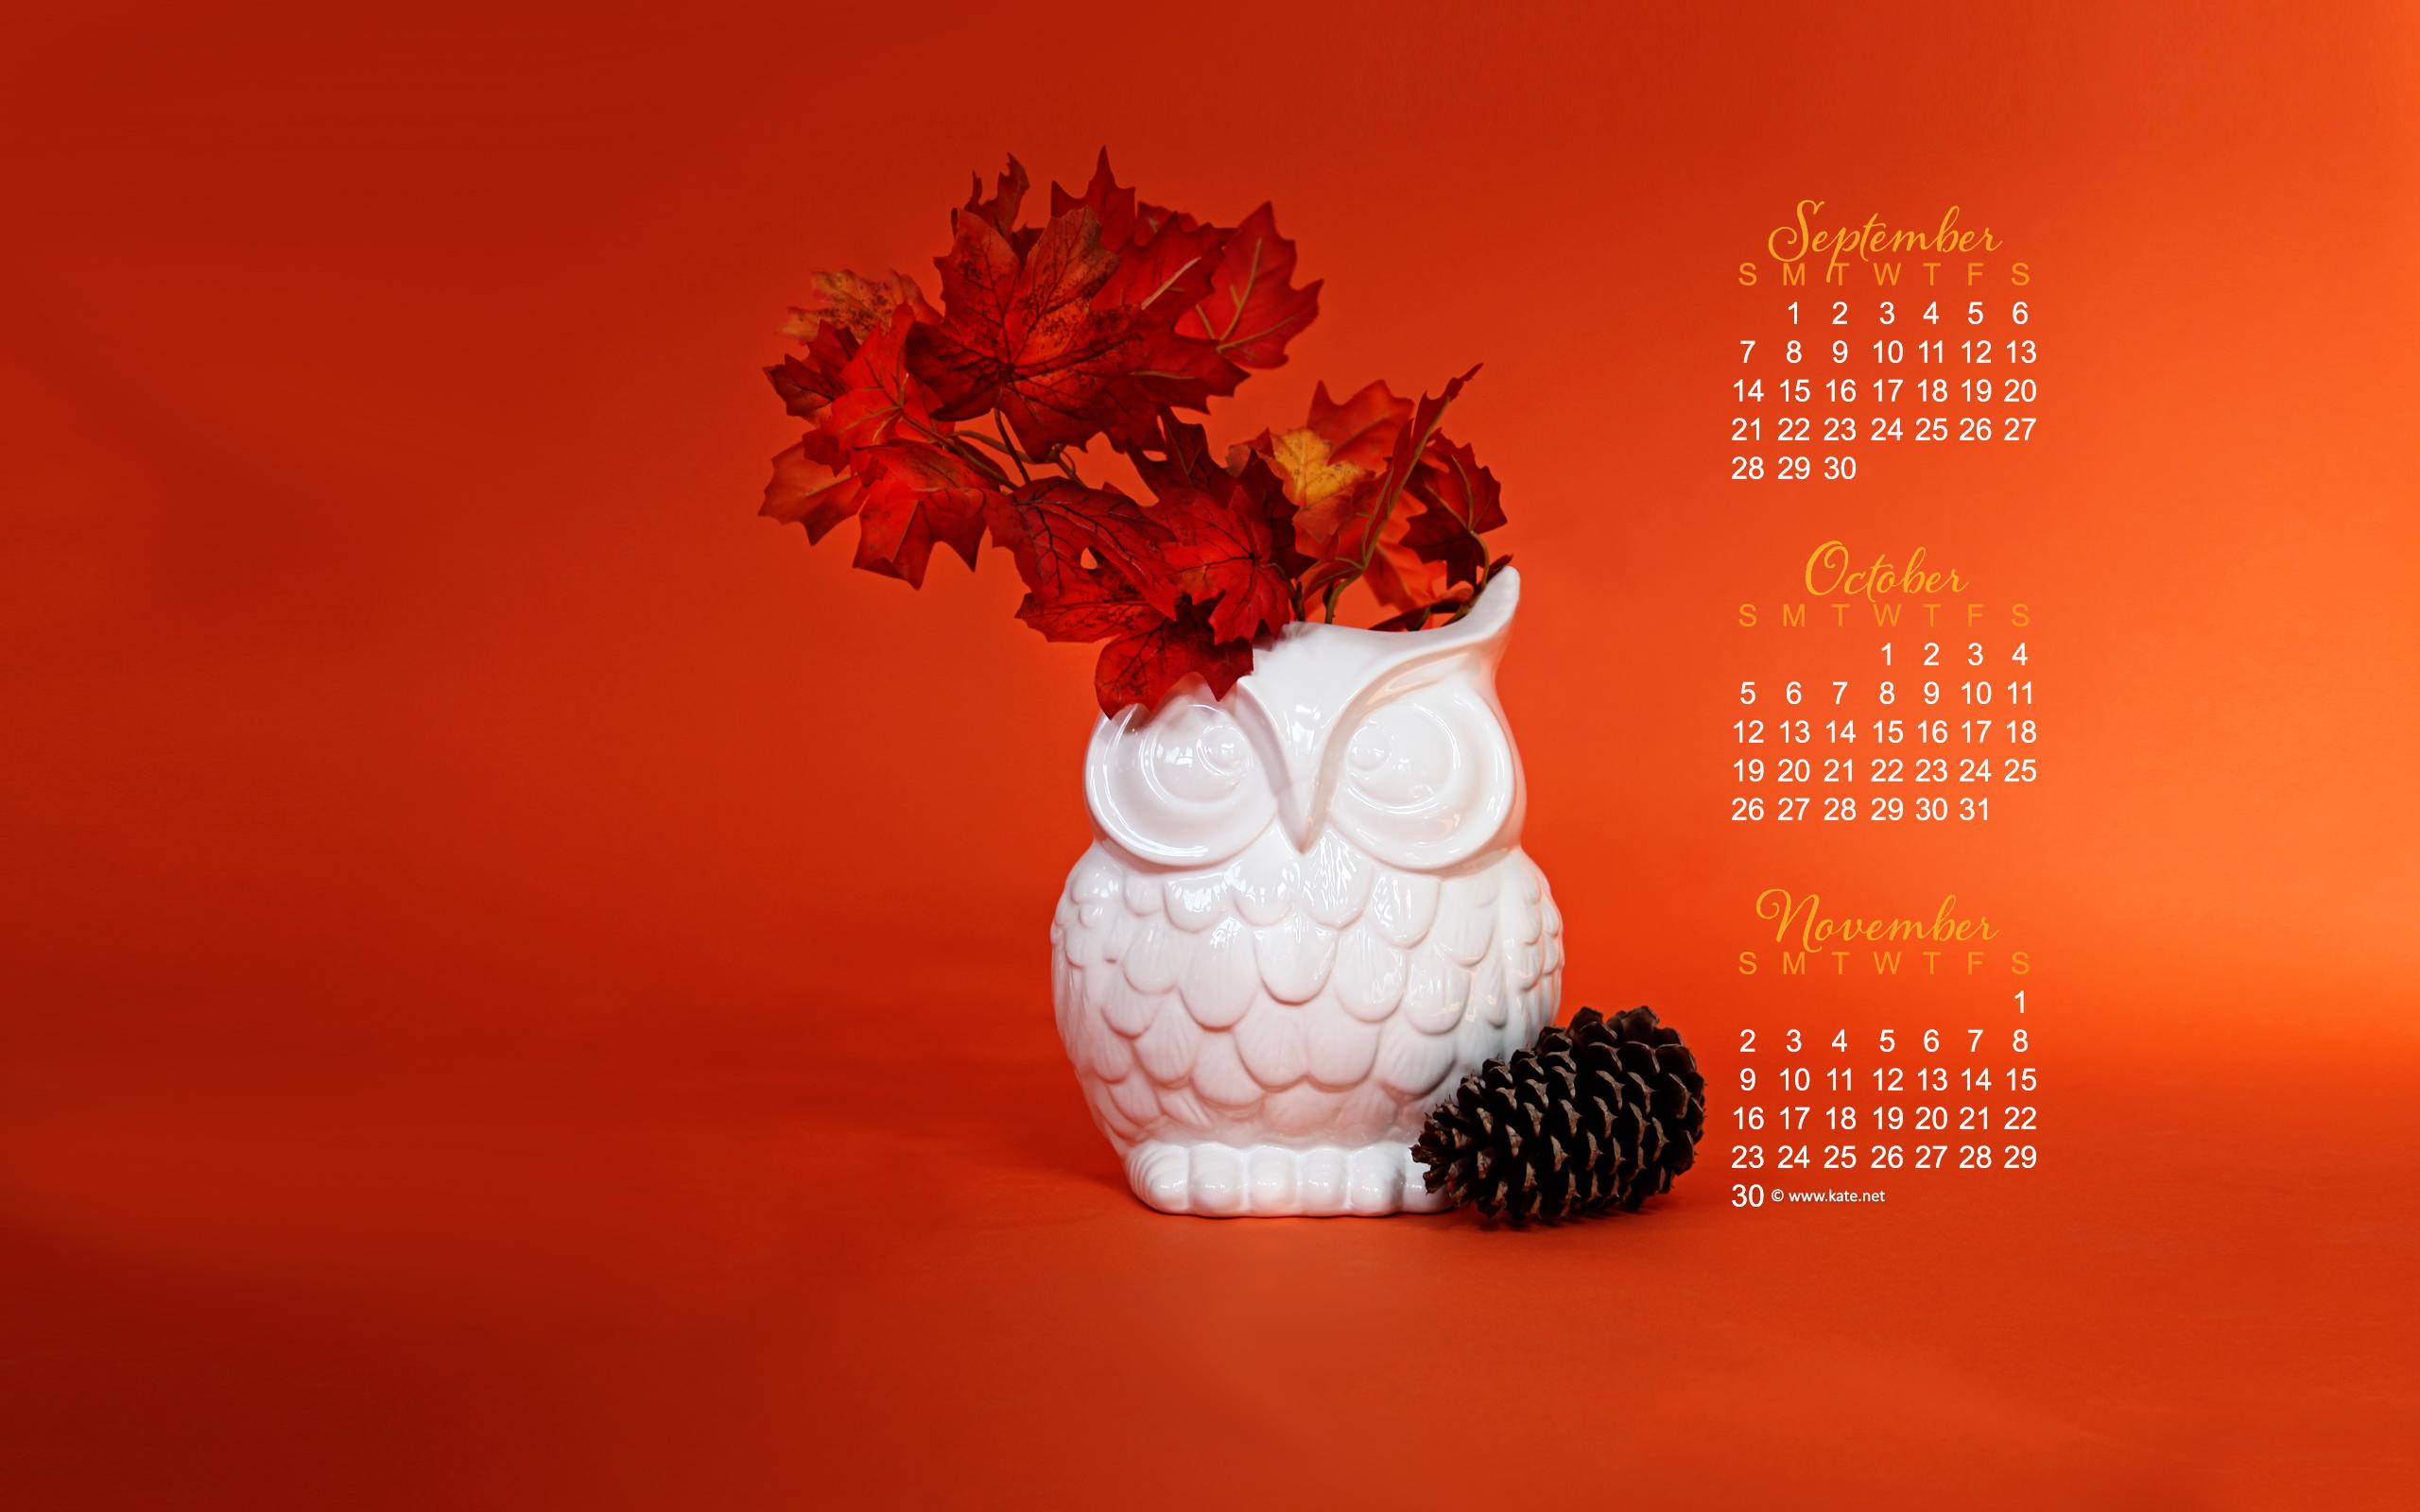 october calendar wallpaper ready for fall photo wallpaper kate net 2560x1600